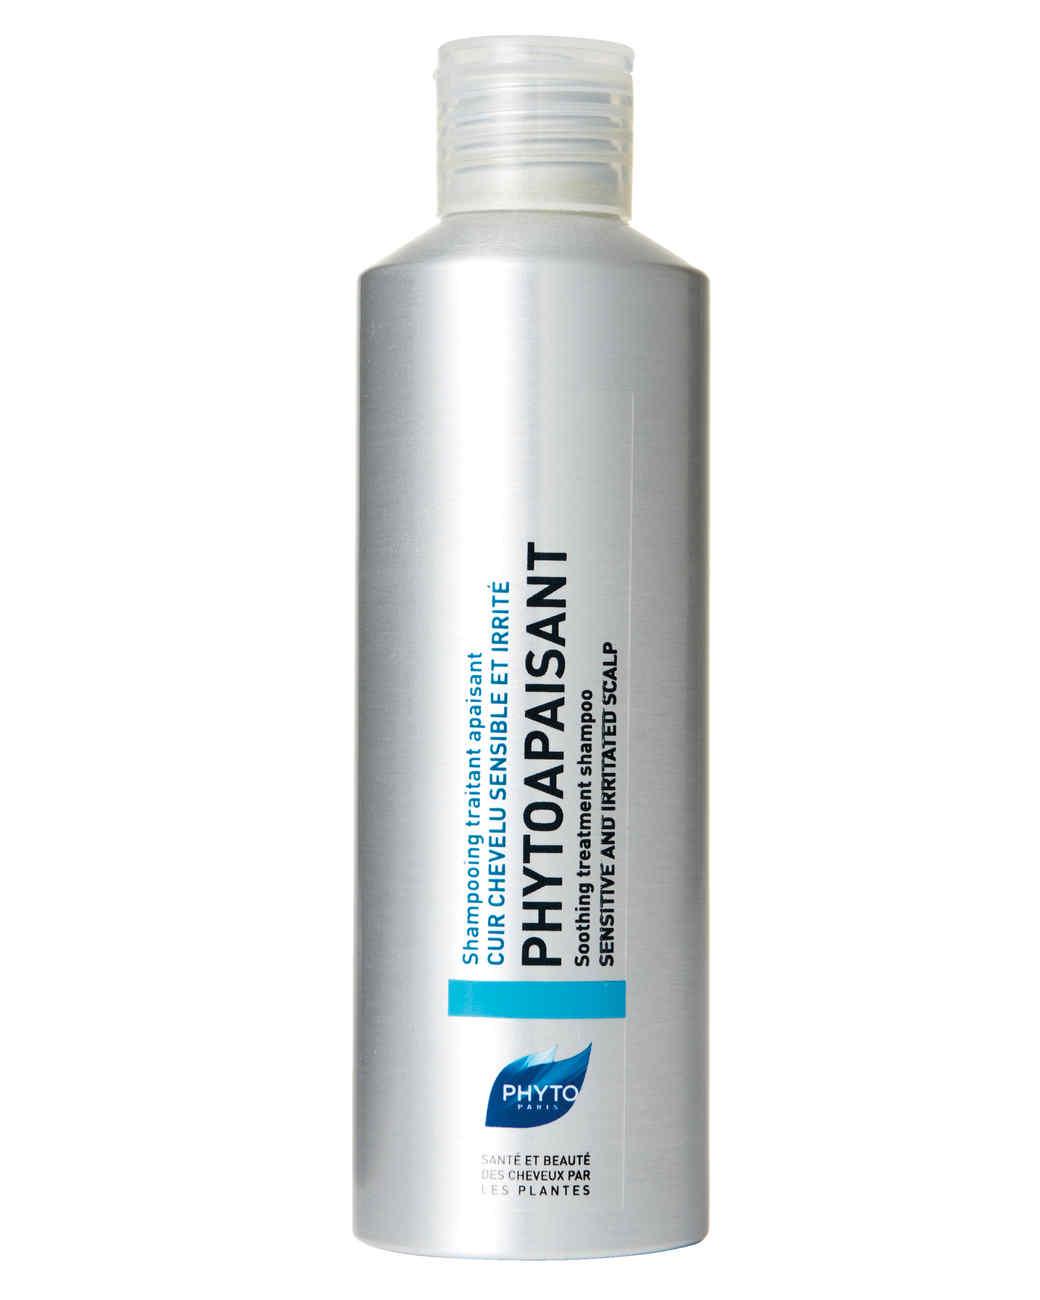 phyto-paris-shampoo-001-d112618.jpg